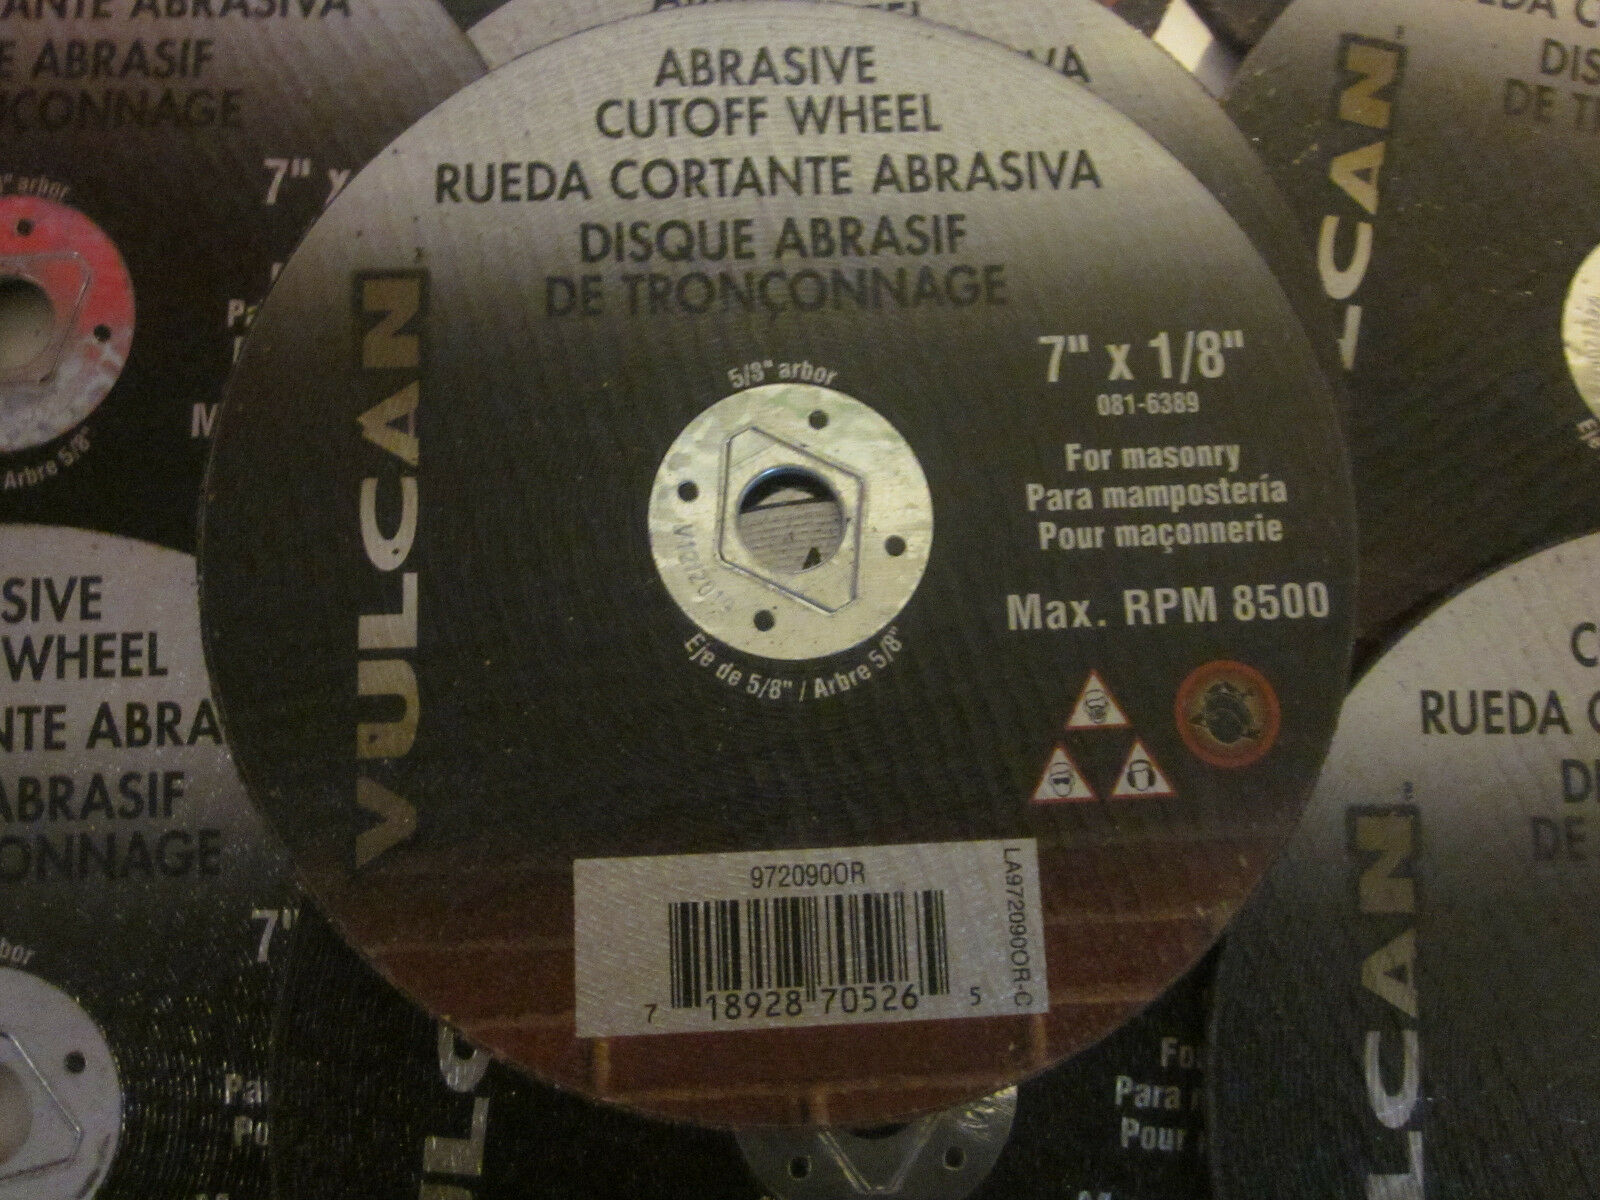 Vulcan 972090or Abrasive Cutoff Wheel 7x1//8 Vulcan 972090or Abrasive Cutoff Wheel 7x1//8